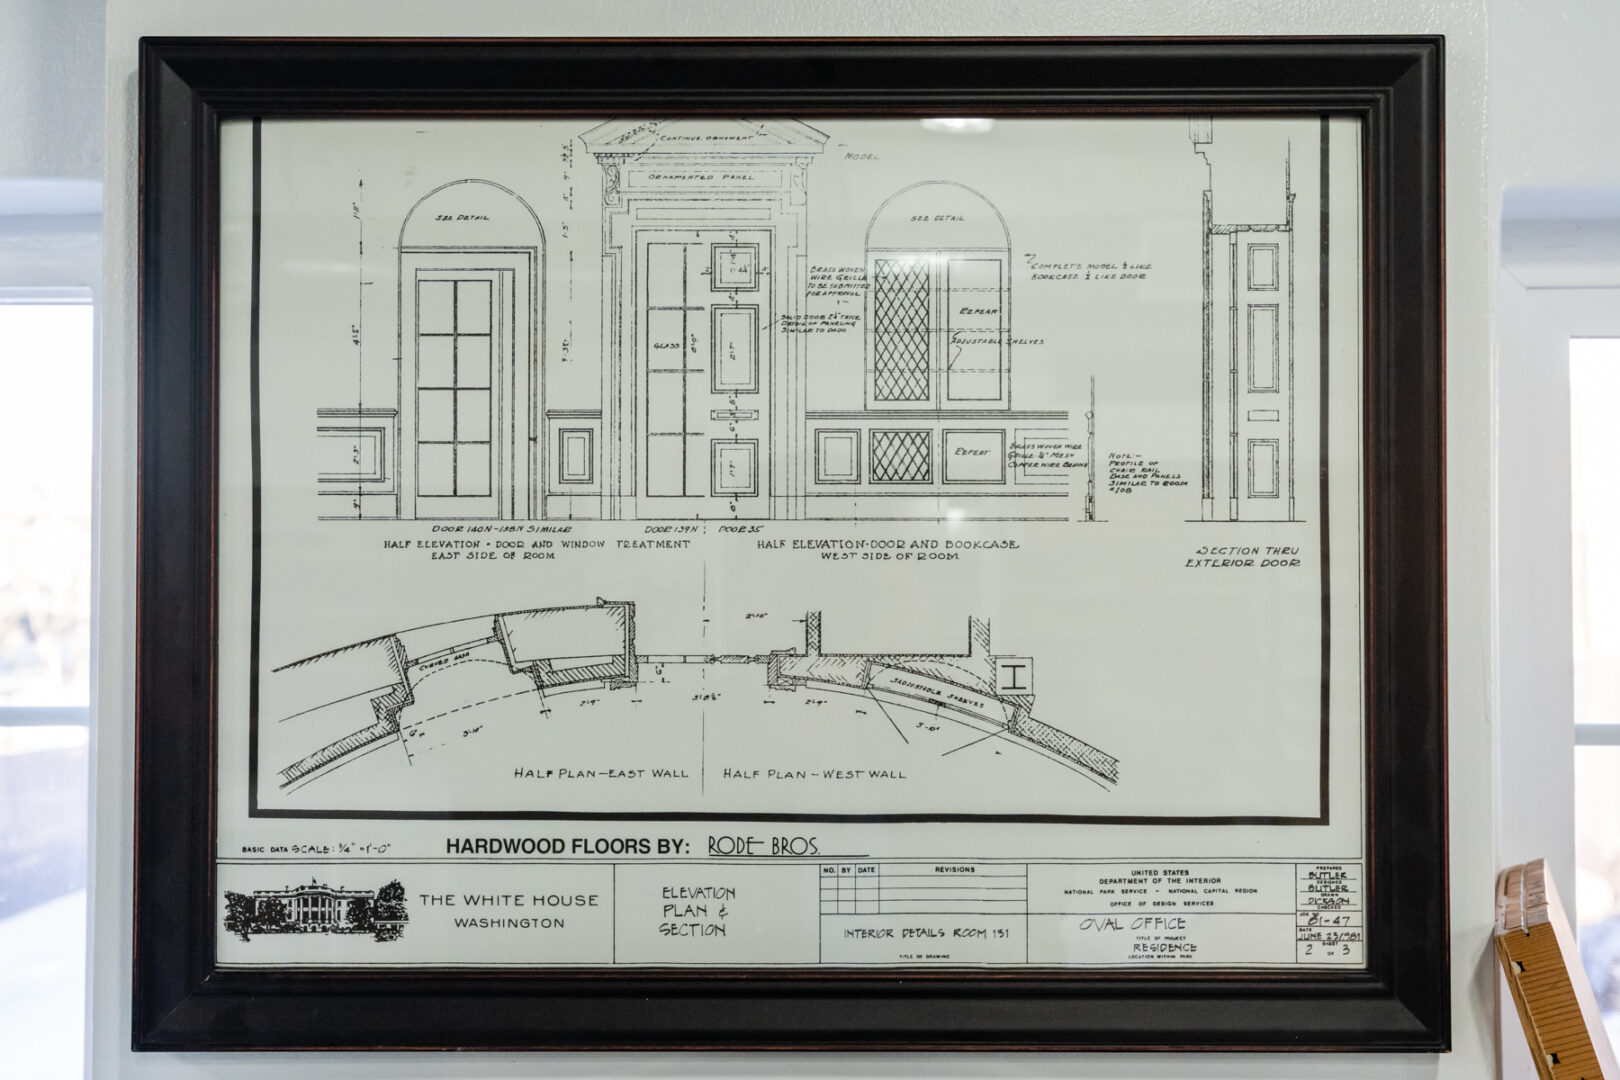 Hardwood flooring blueprint